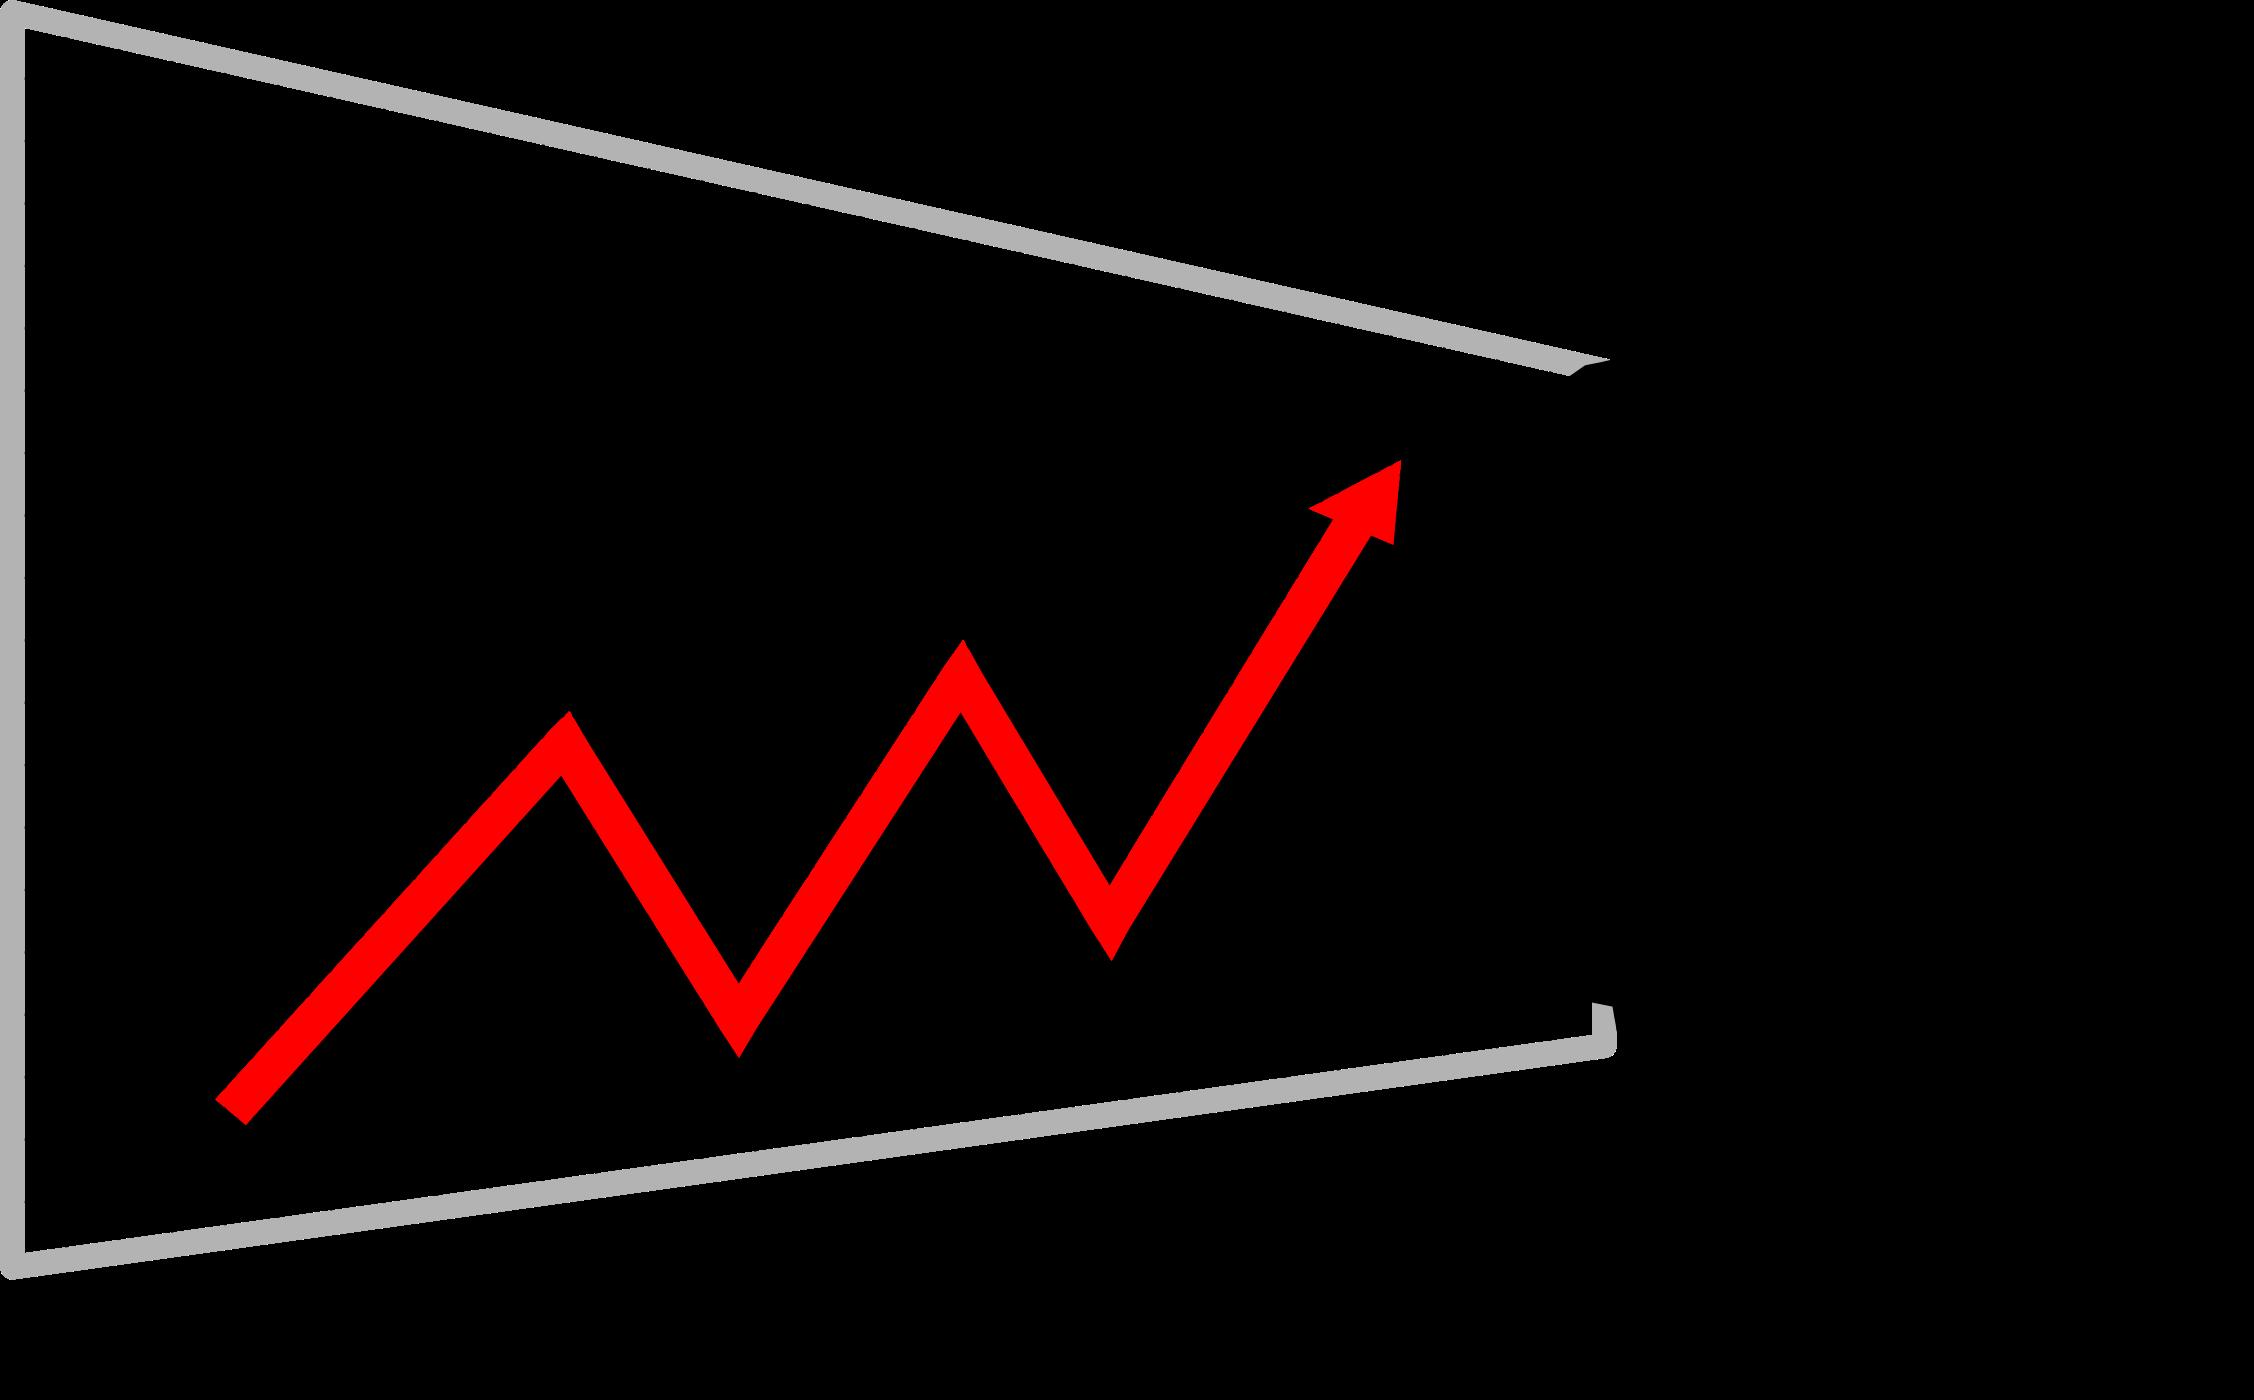 Graph clipart new business Clipart High Five High Graph